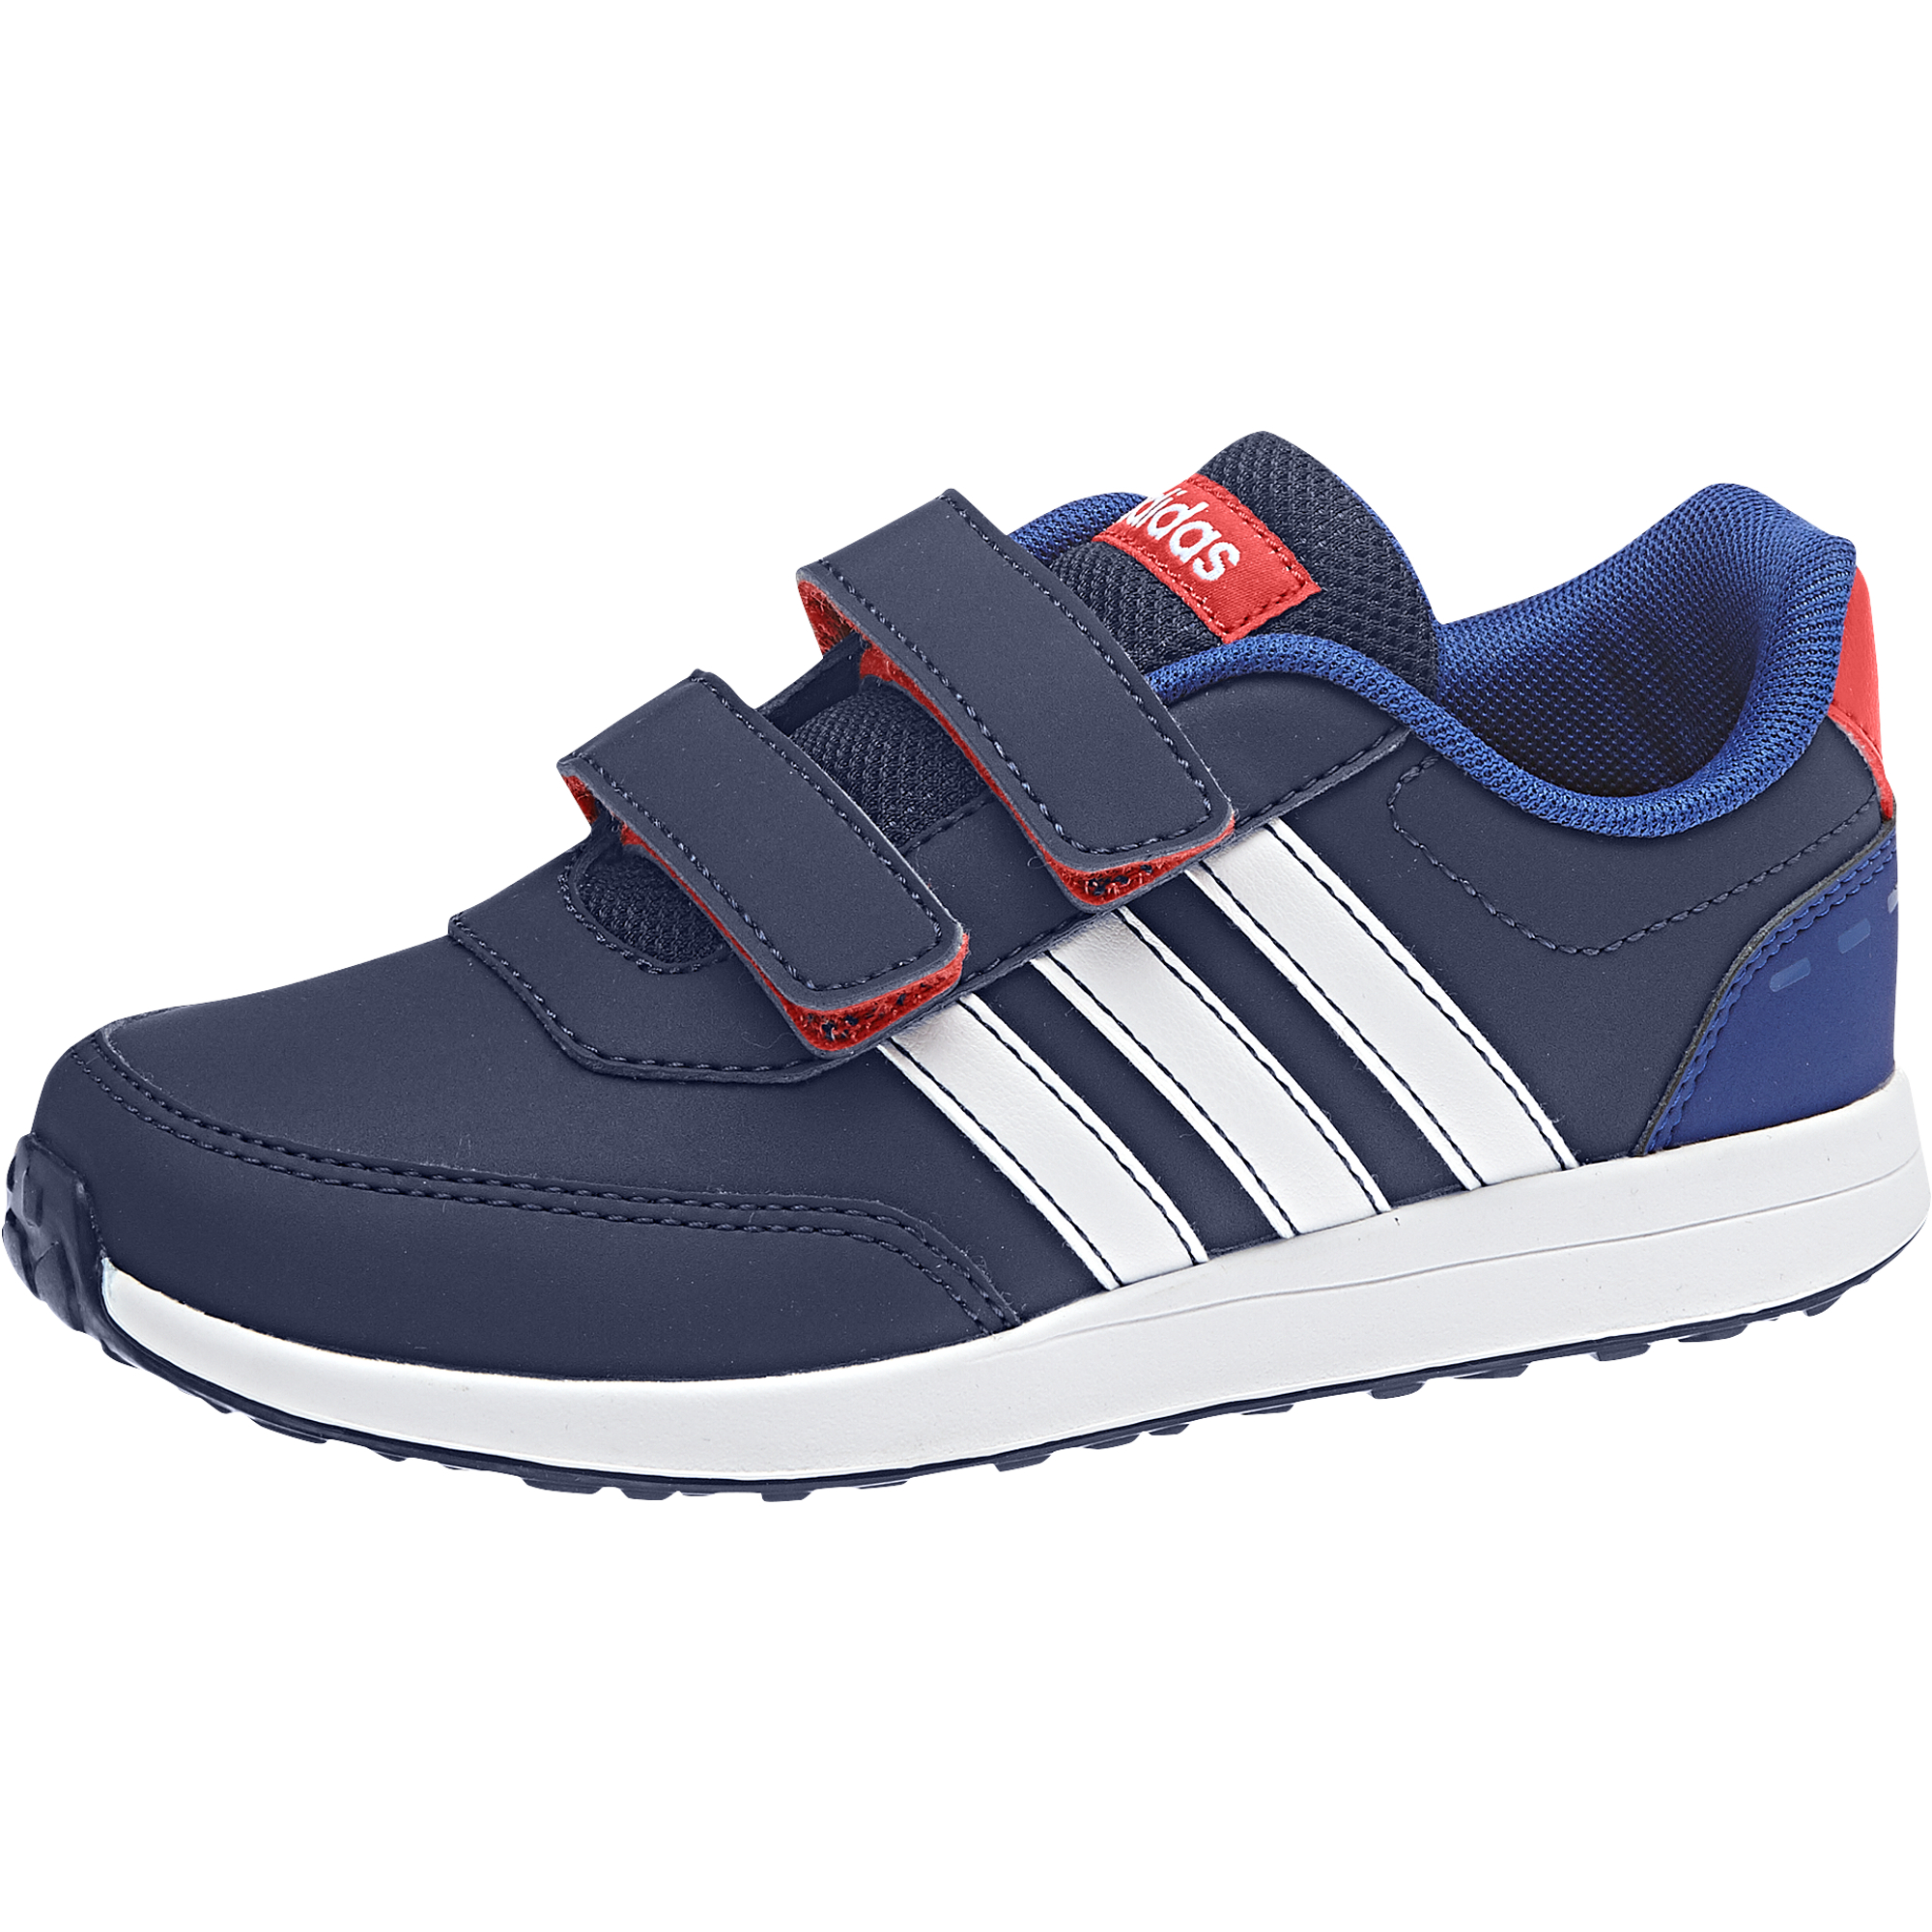 Buty sneakers Adidas VS Switch 2 CMF B76055